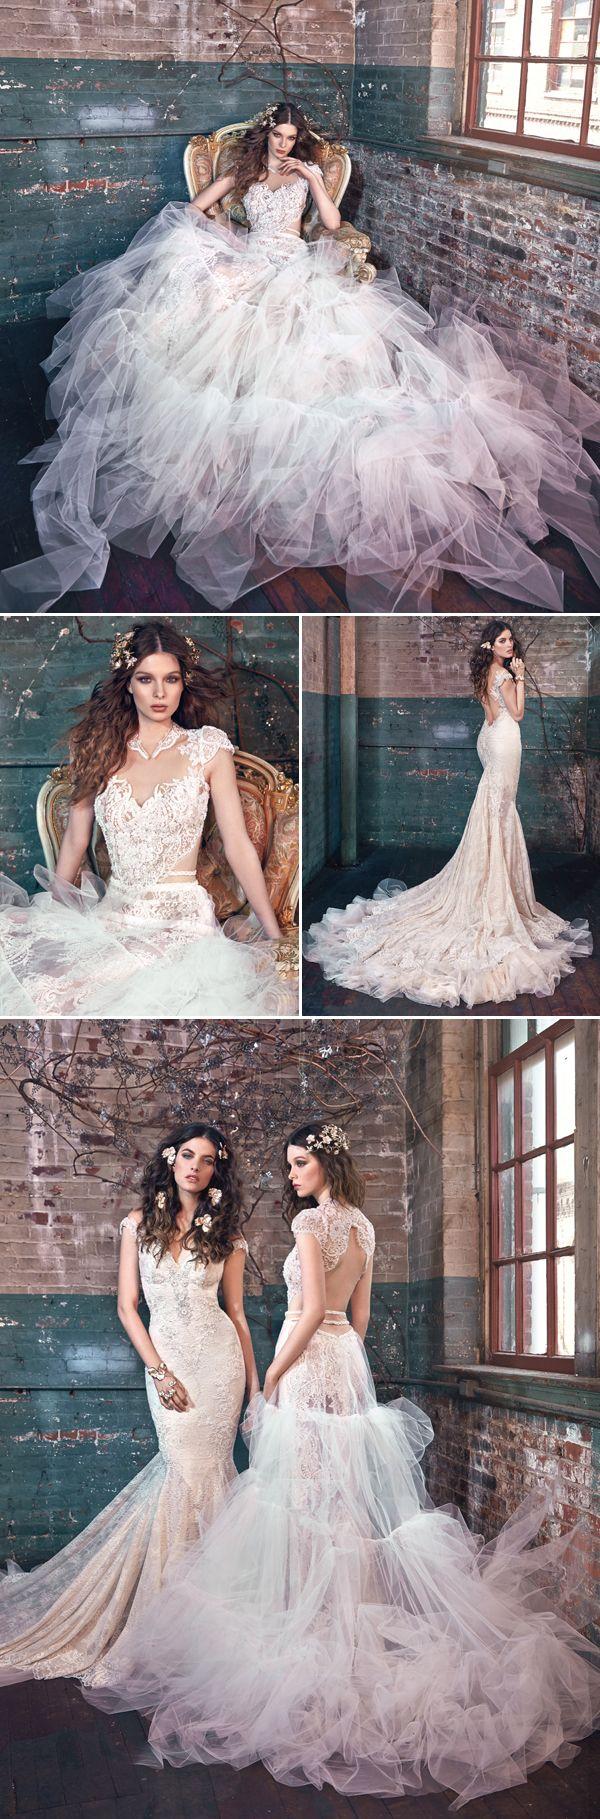 La sposa pandora wedding dress   best wedding dress images on Pinterest  Wedding ideas Princess